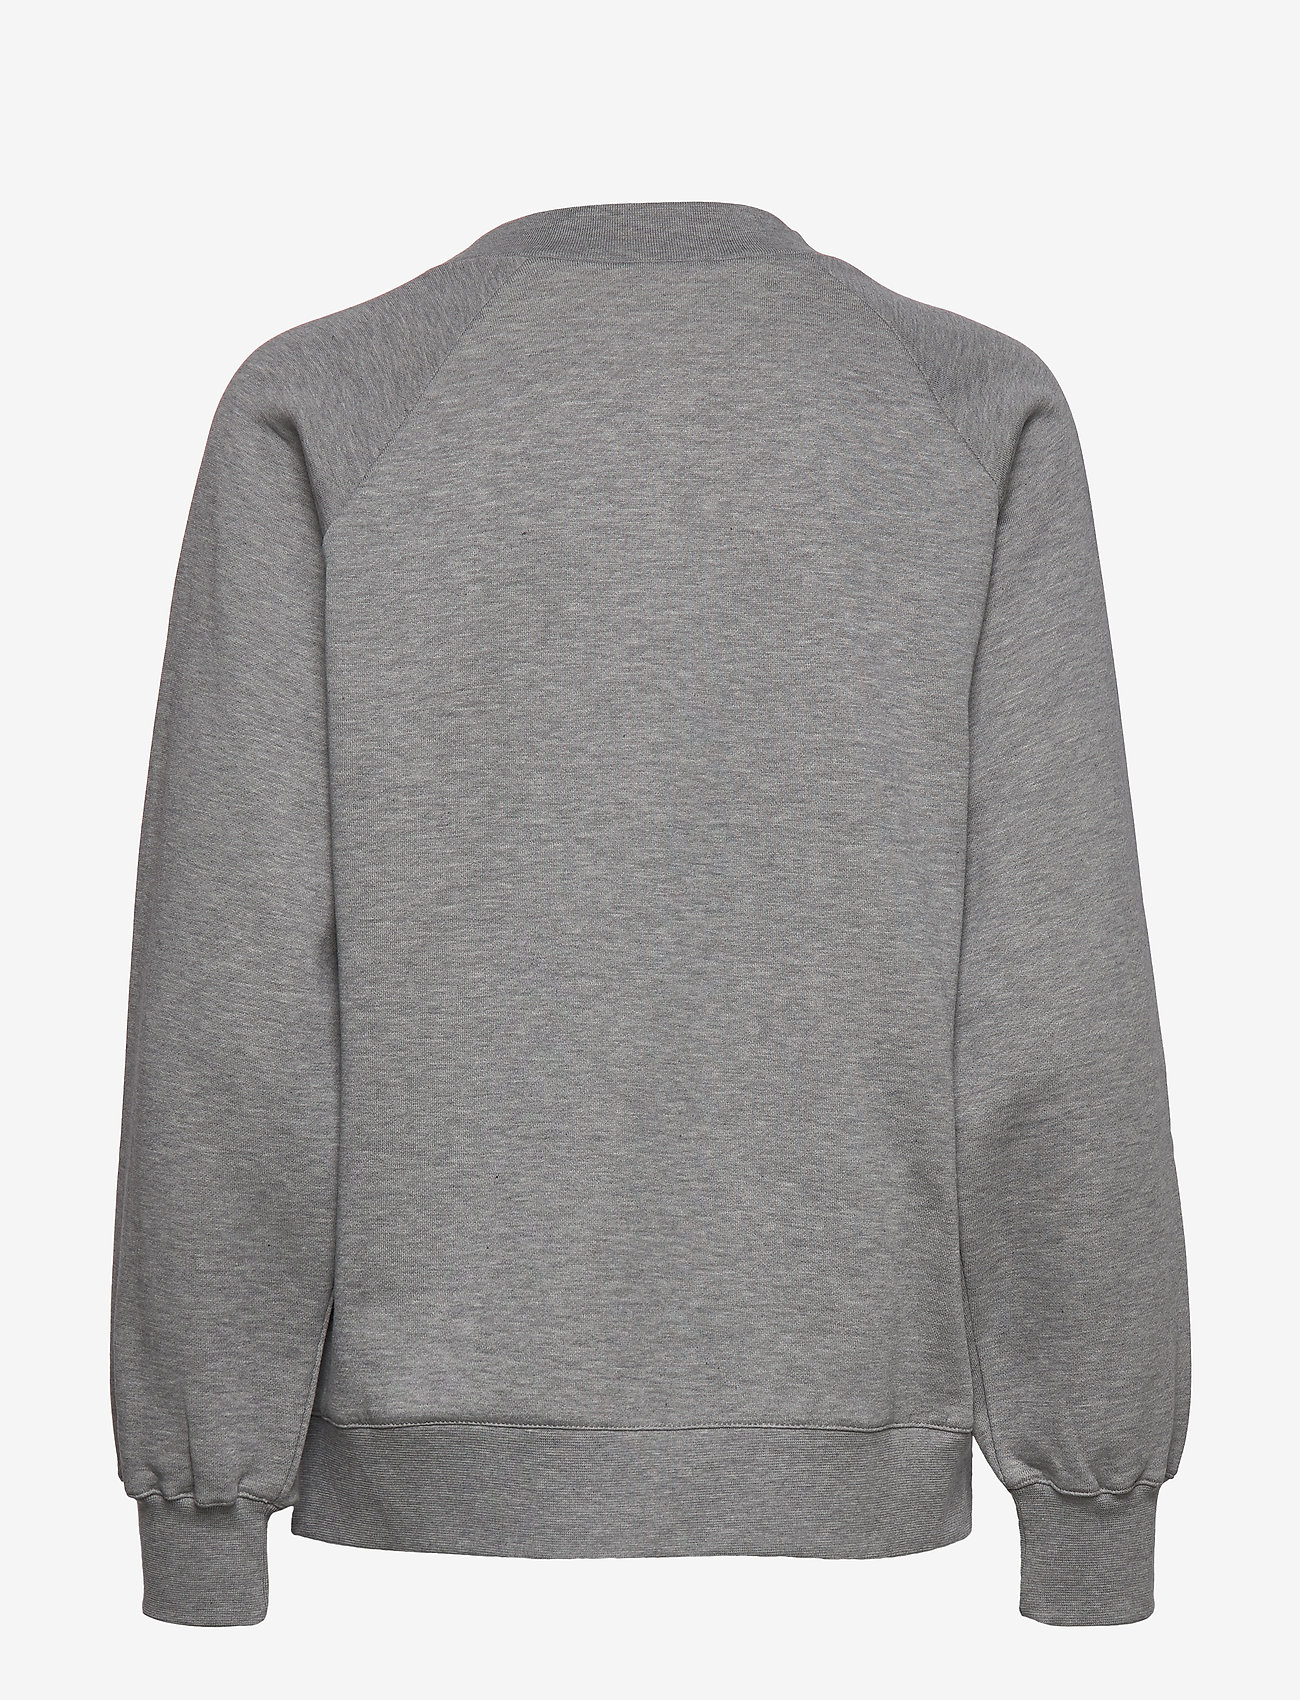 hálo - KAJO college - sweatshirts - grey - 1